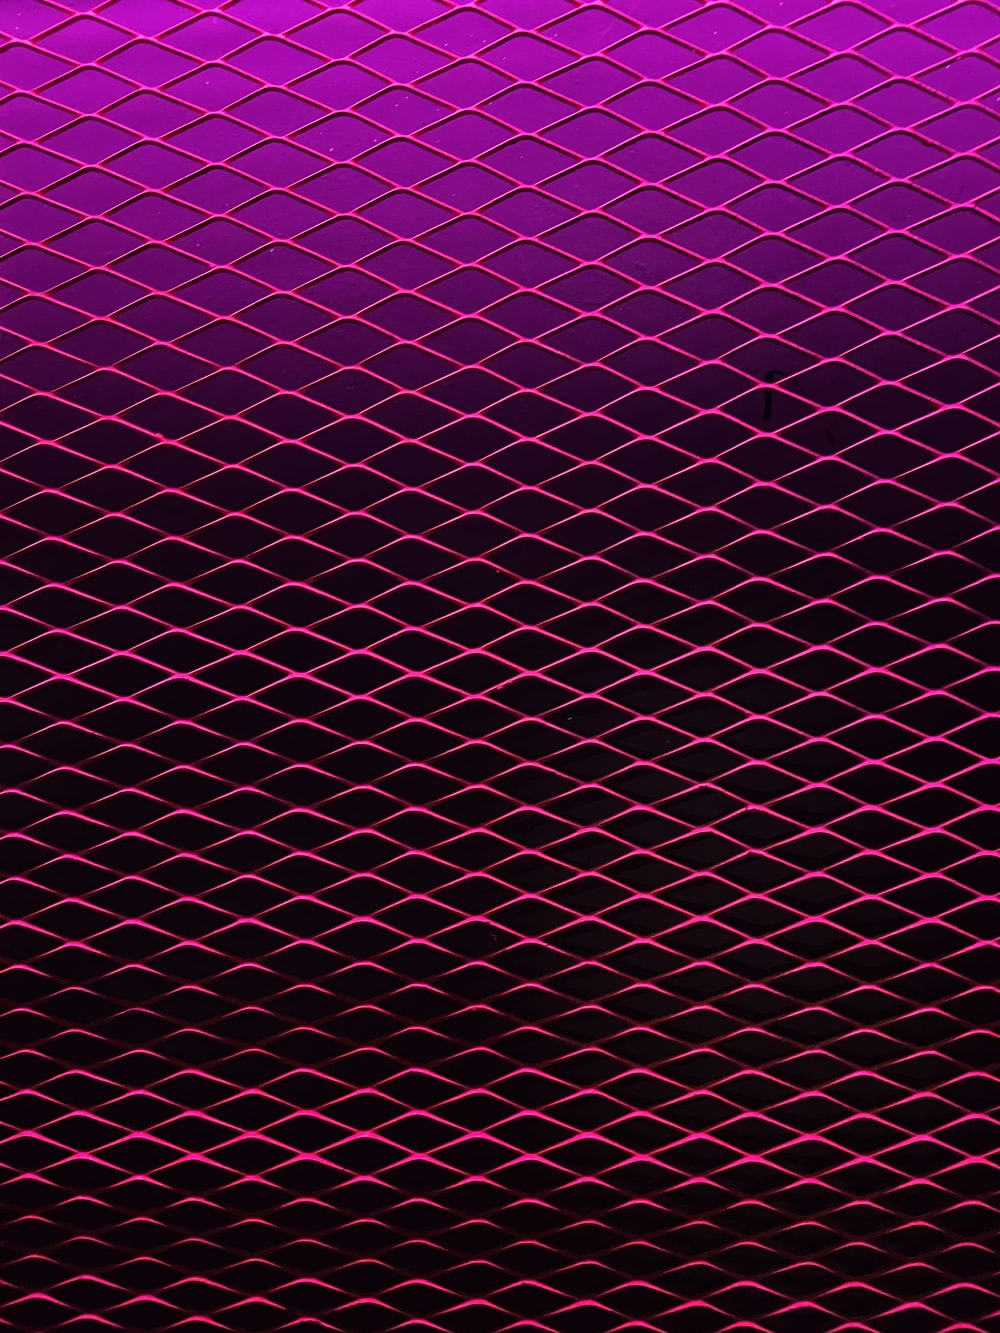 purple and pink polka dot textile